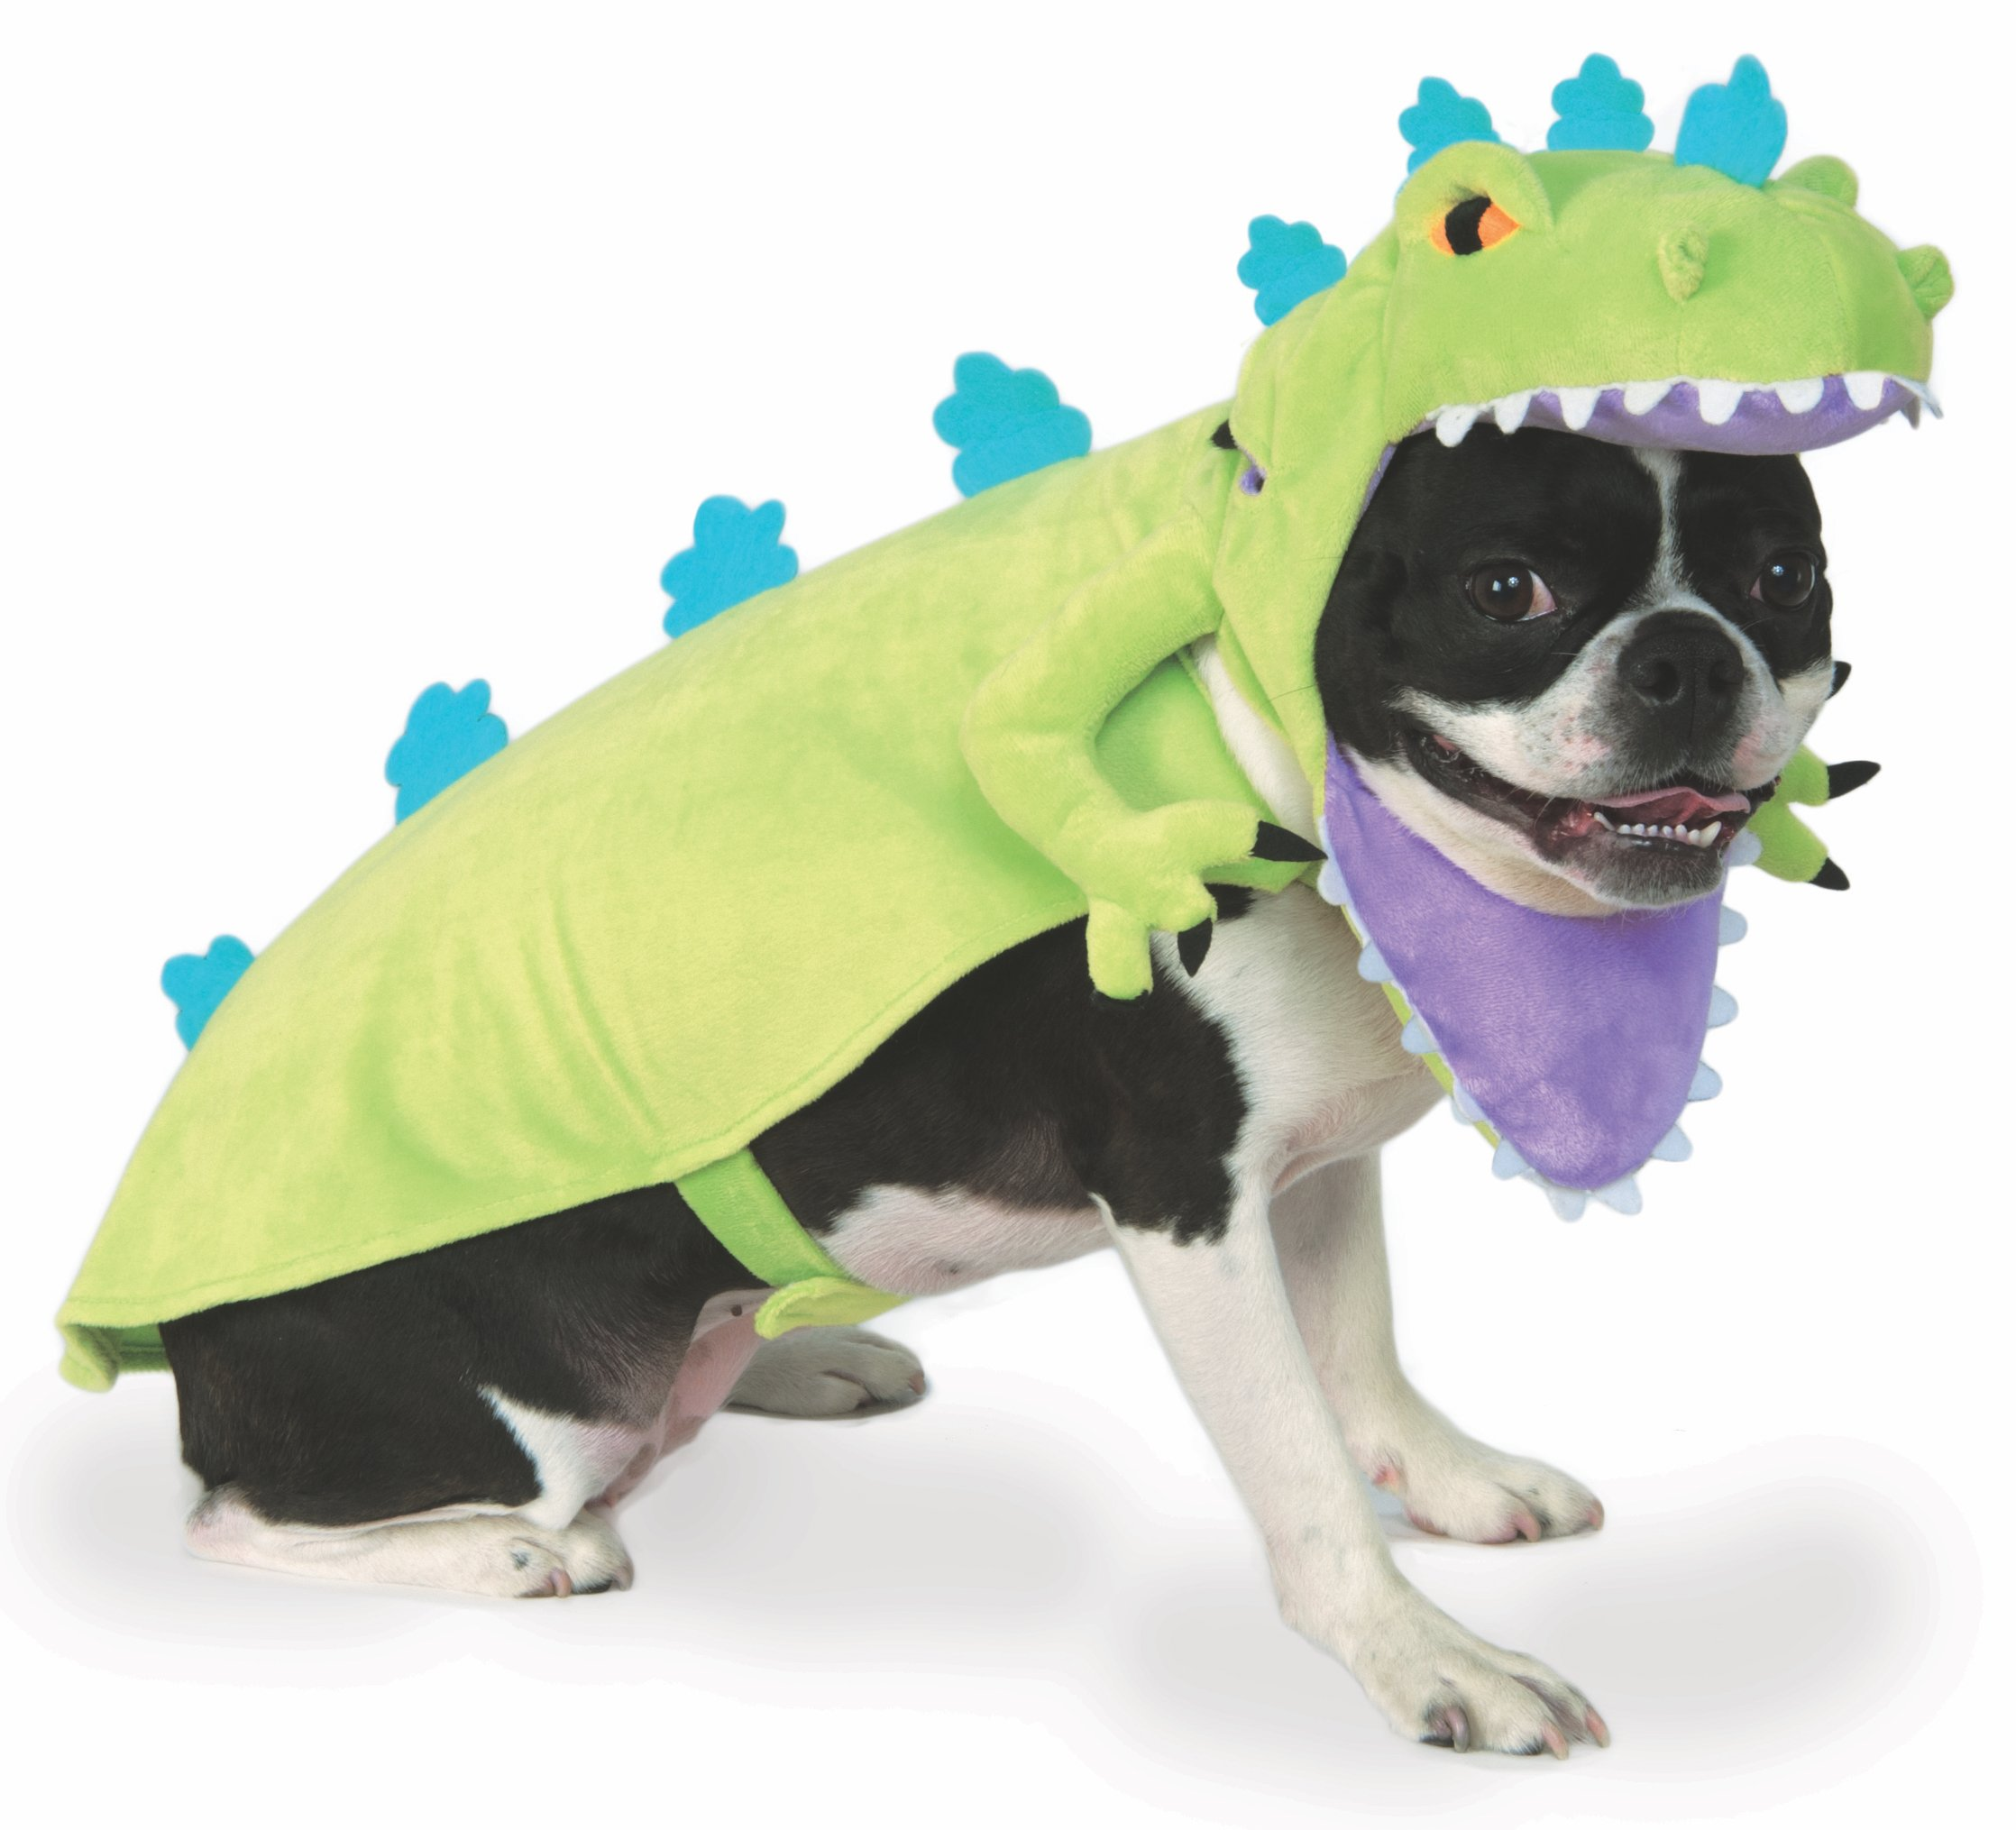 Nickelodeon Rubie's Rugrats Reptar Pet Costume, Small